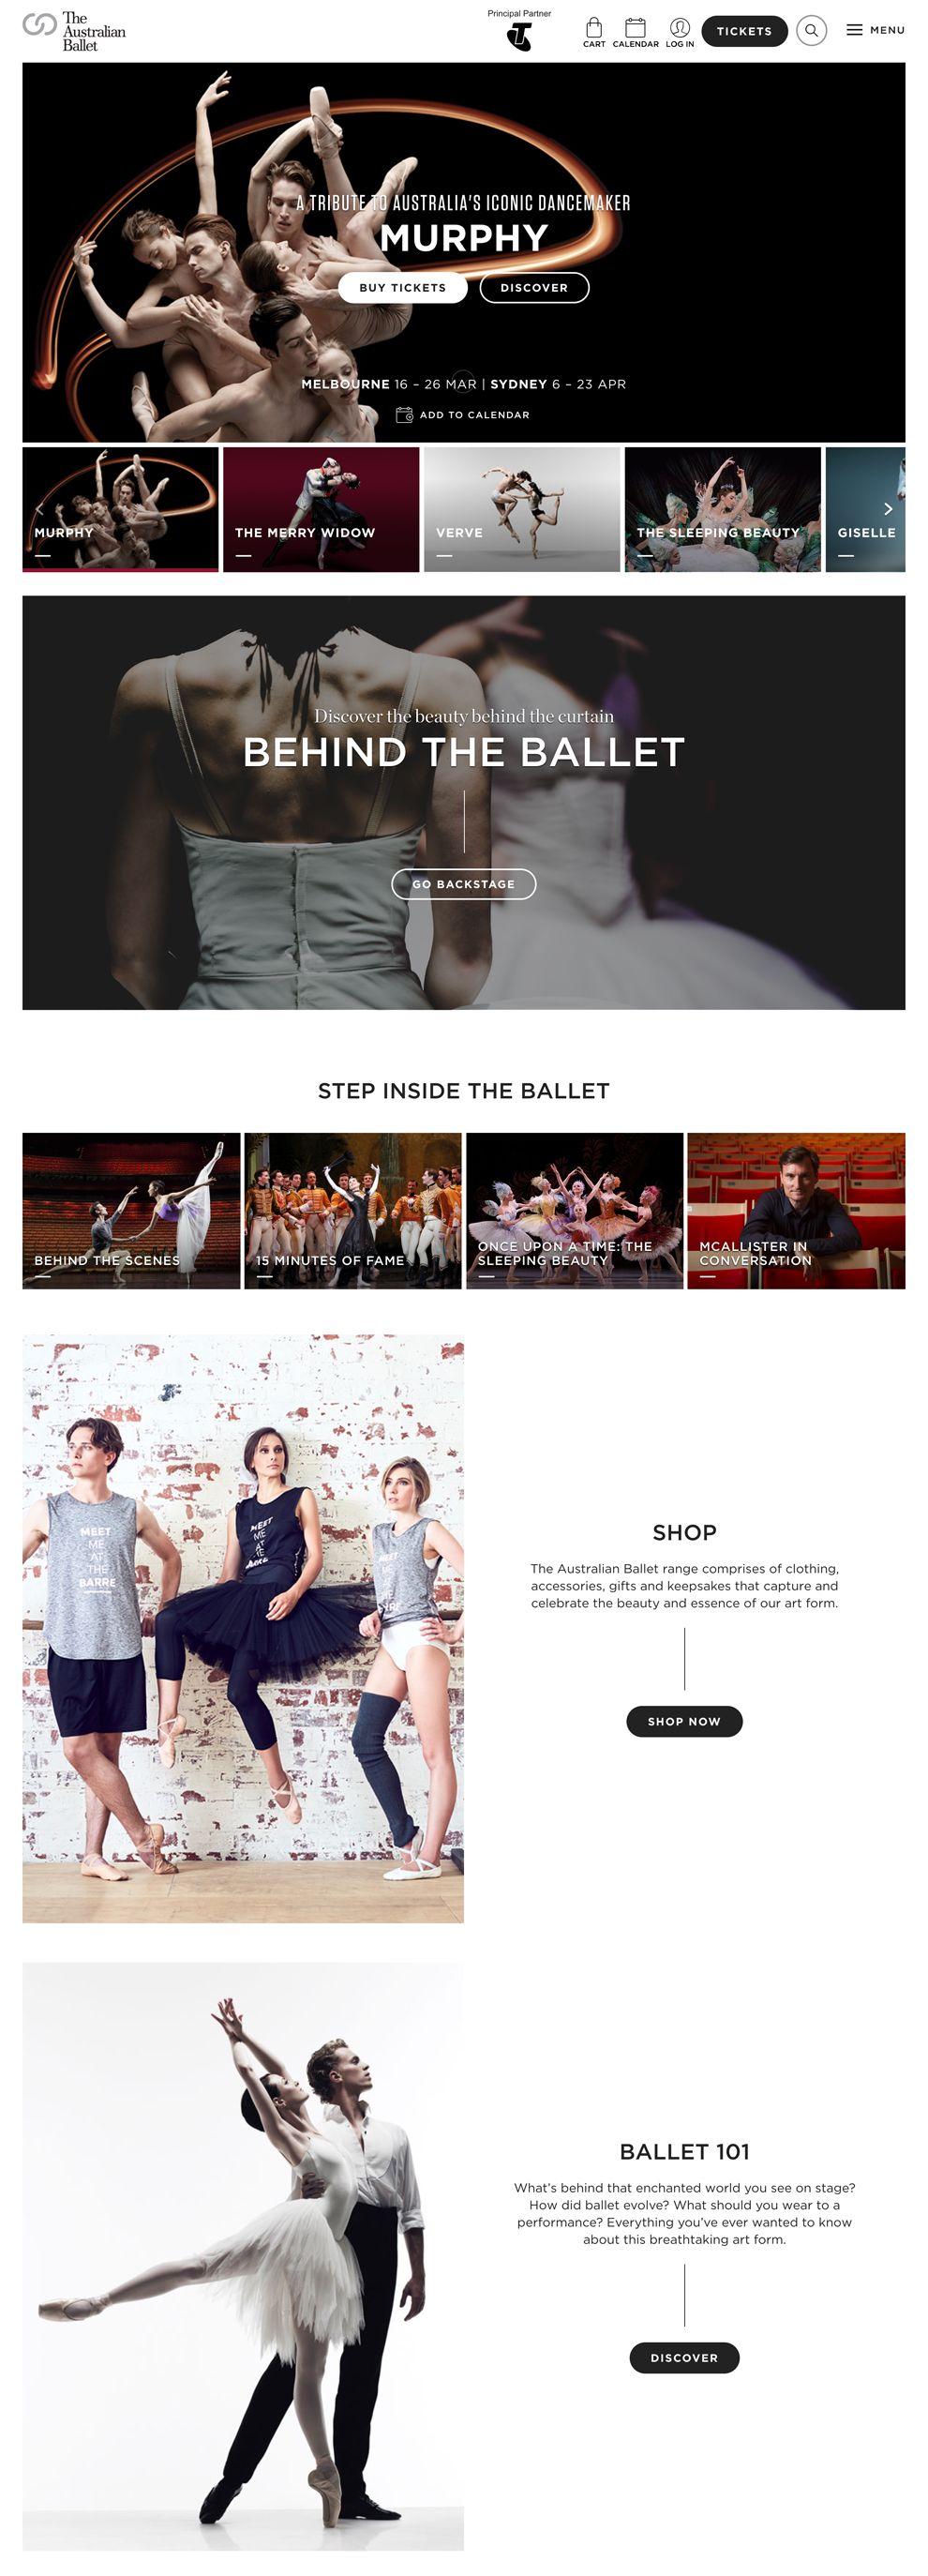 Australian Ballet Beautiful Homepage